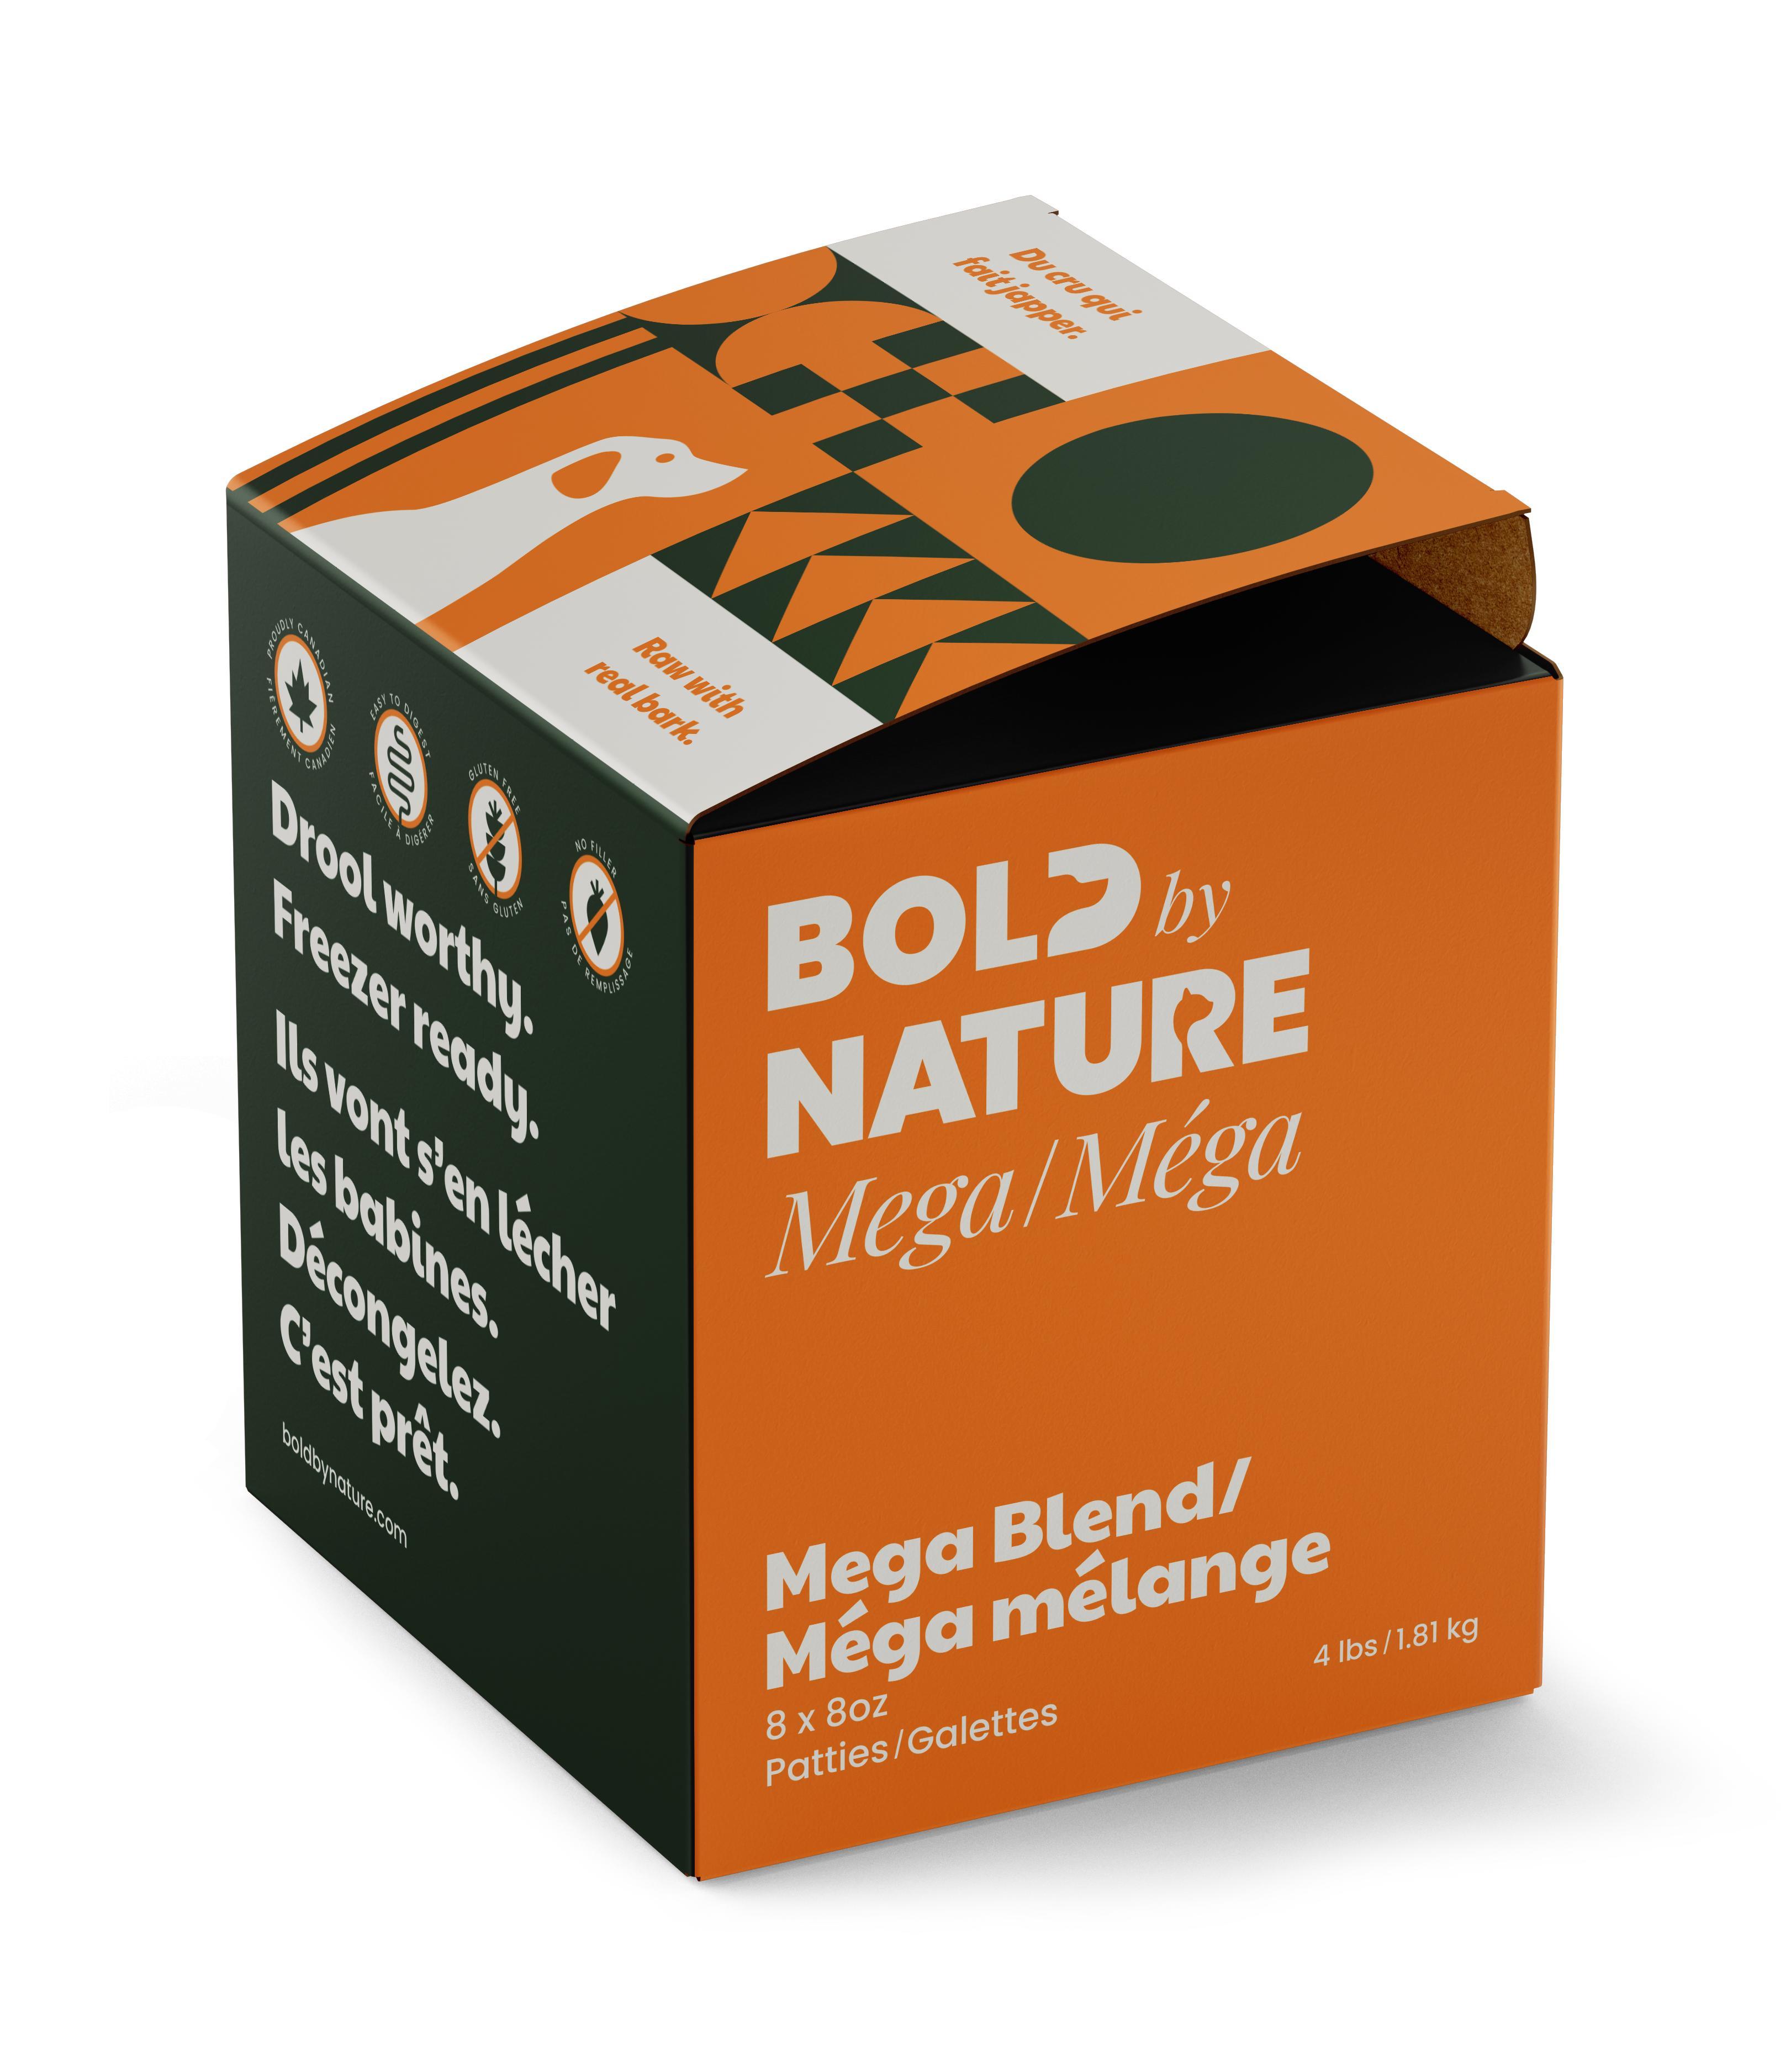 Bold by Nature Dog Mega Blend Patties Image